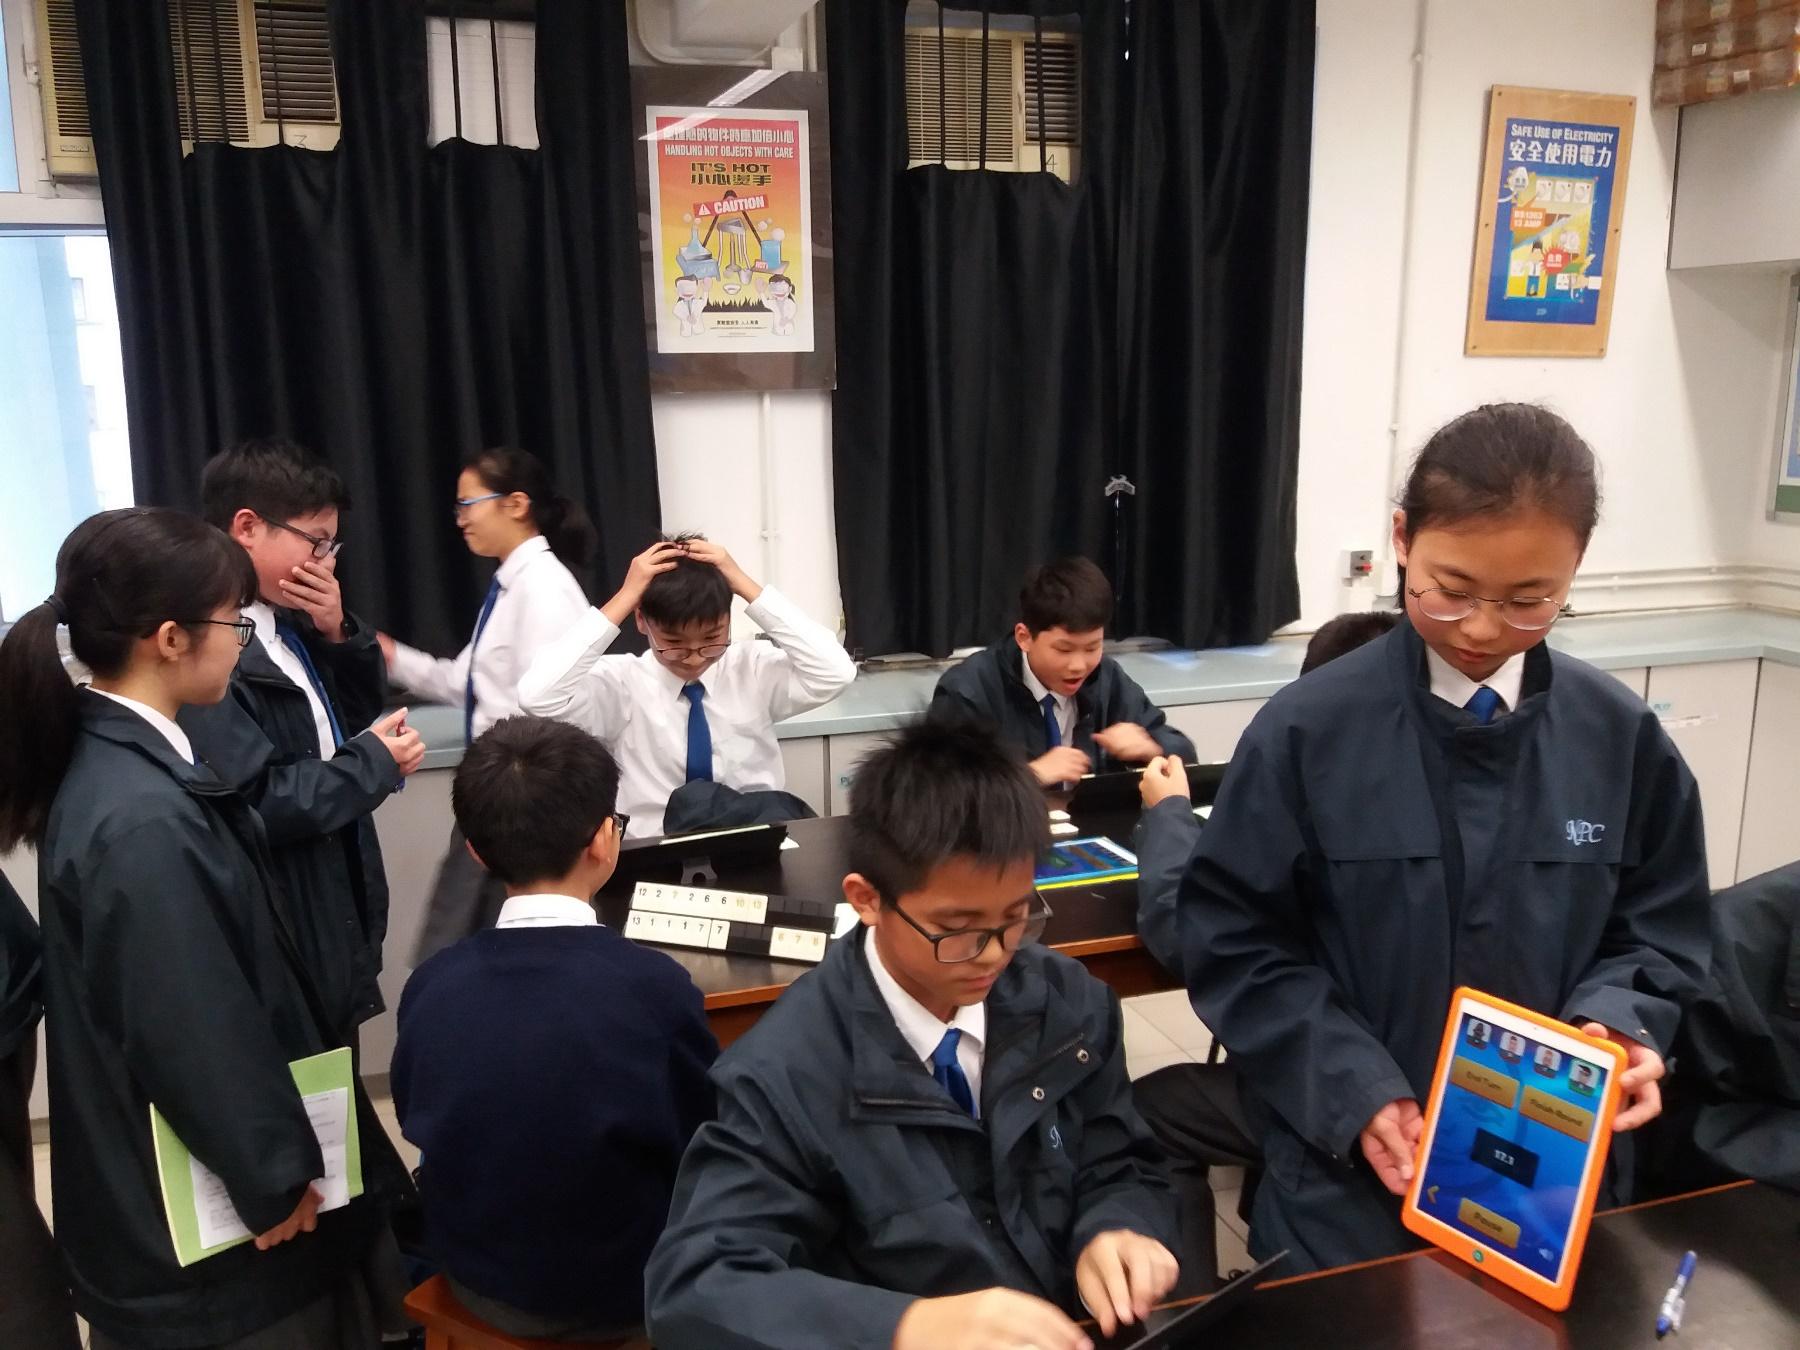 http://npc.edu.hk/sites/default/files/20190116_163338.jpg